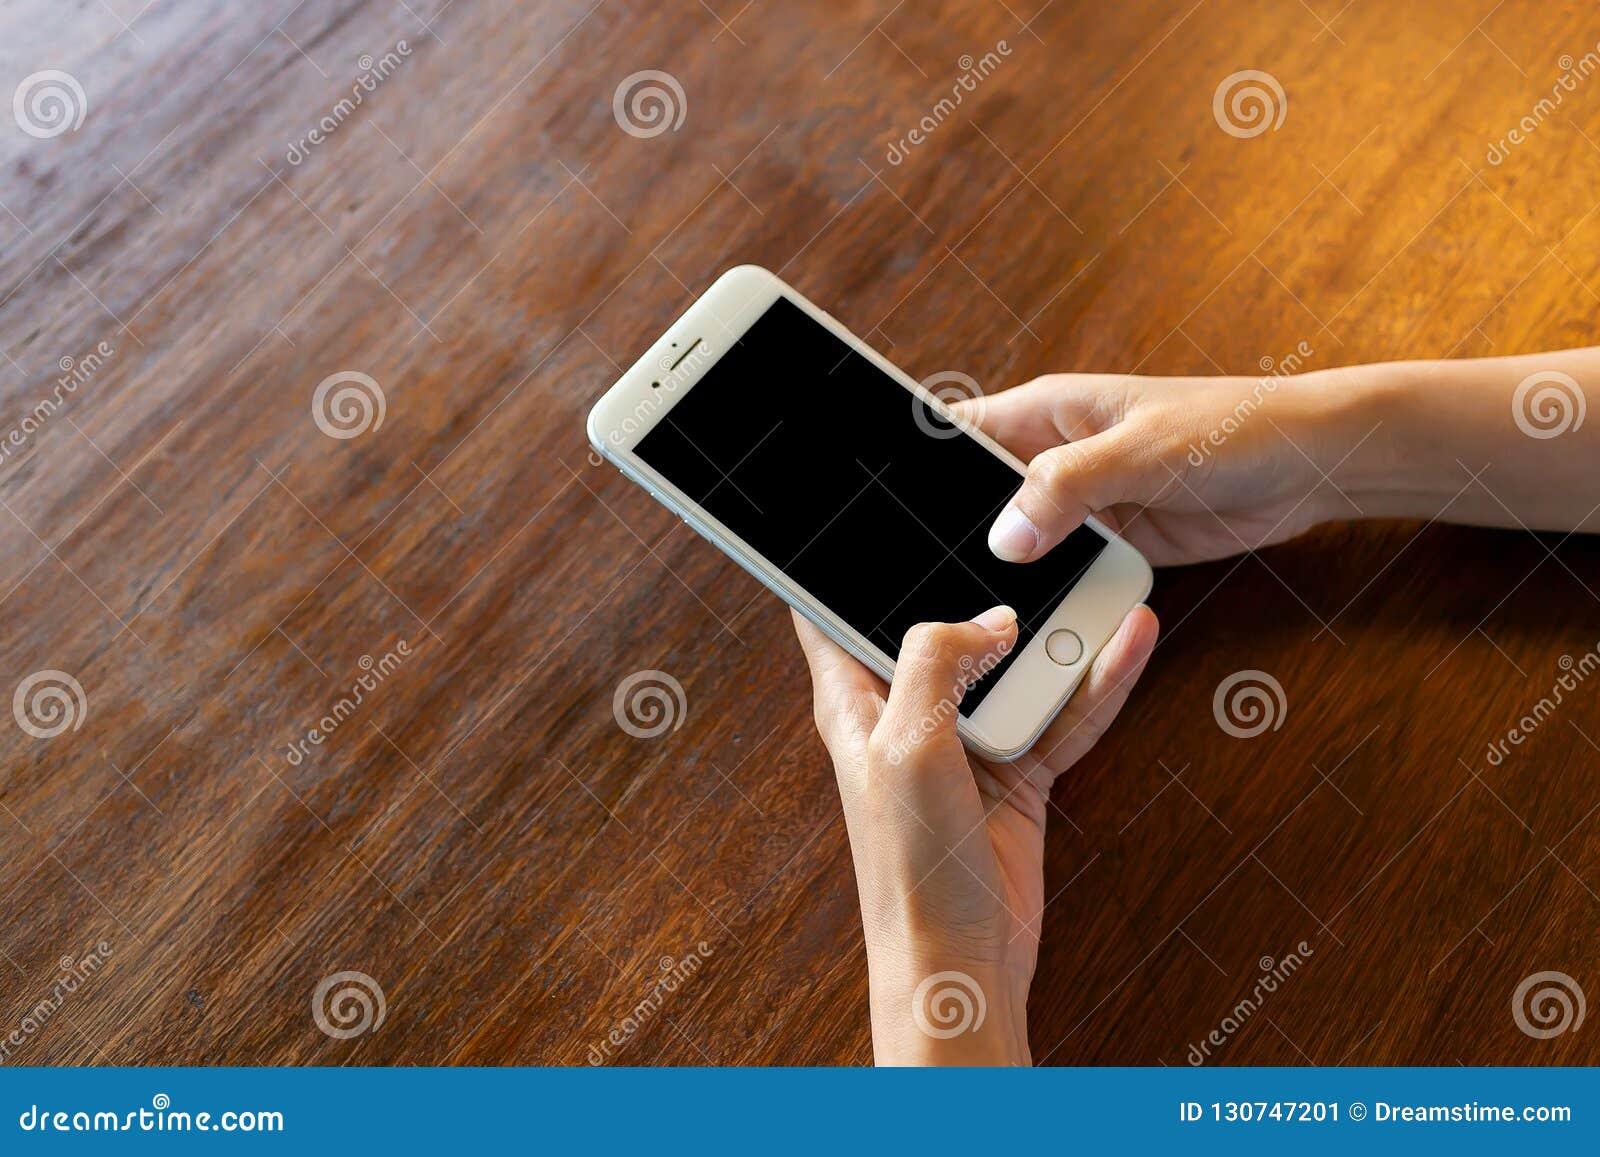 Black screen phone on wooden desk